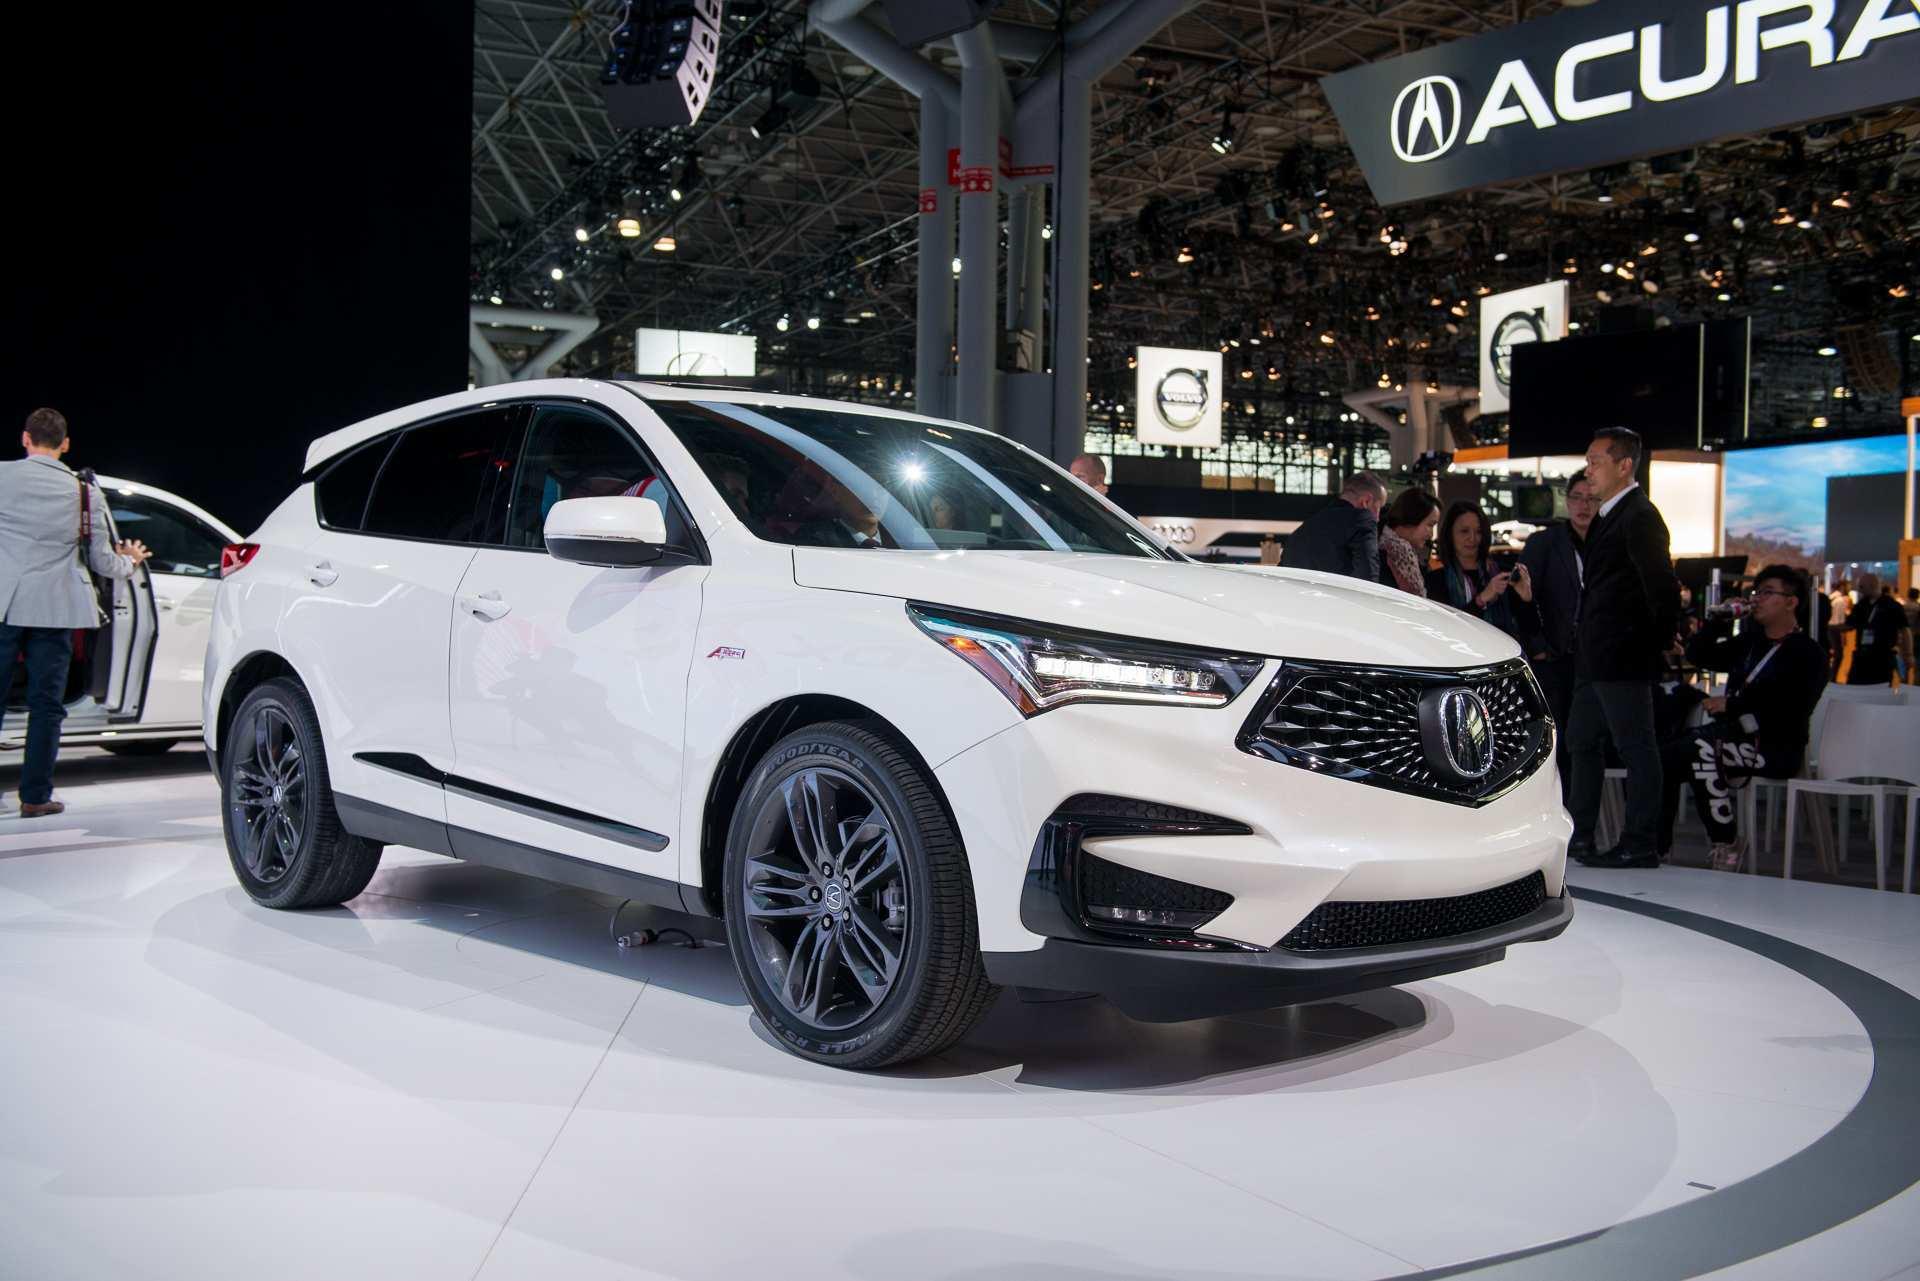 52 Concept of 2019 Acura Rdx Photos Rumors with 2019 Acura Rdx Photos